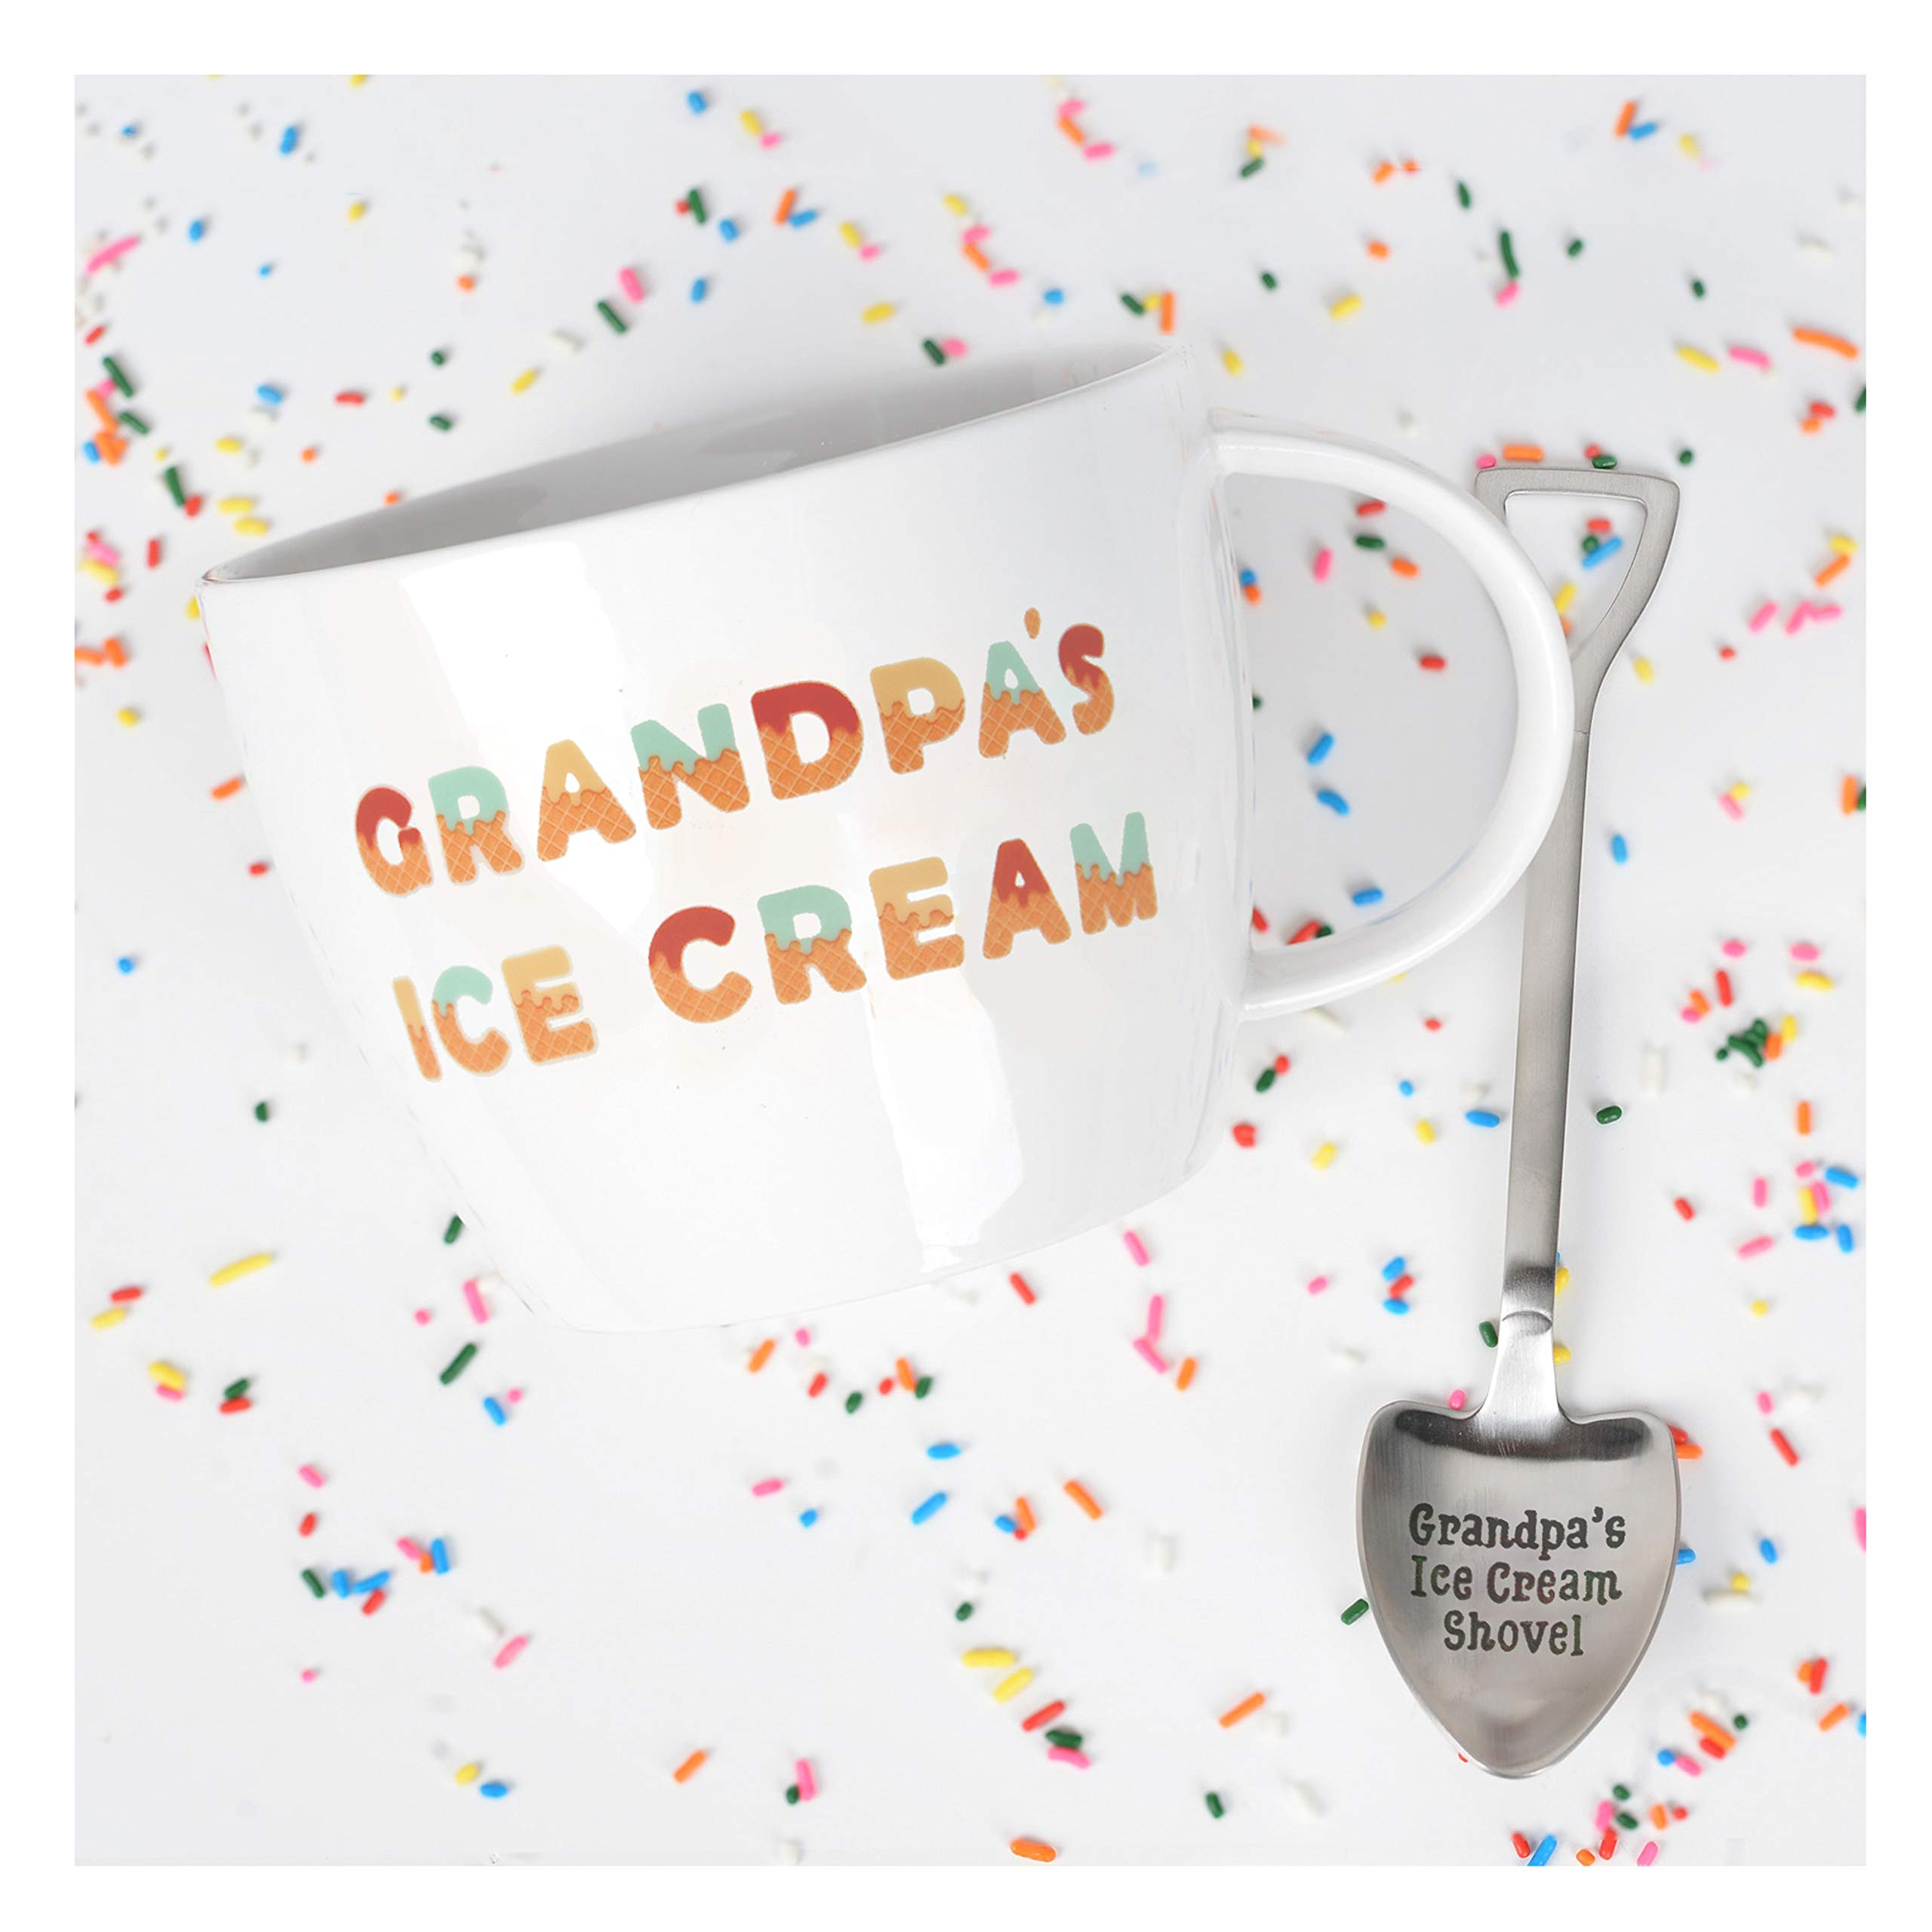 Josephine on Caffeine Gifts for Grandpa - Grandpa's Ice Cream Bowl and Engraved Spoon Grandpa's Ice Cream Shovel - Ideal or Birthday Gift by Josephine on Caffeine (Image #1)